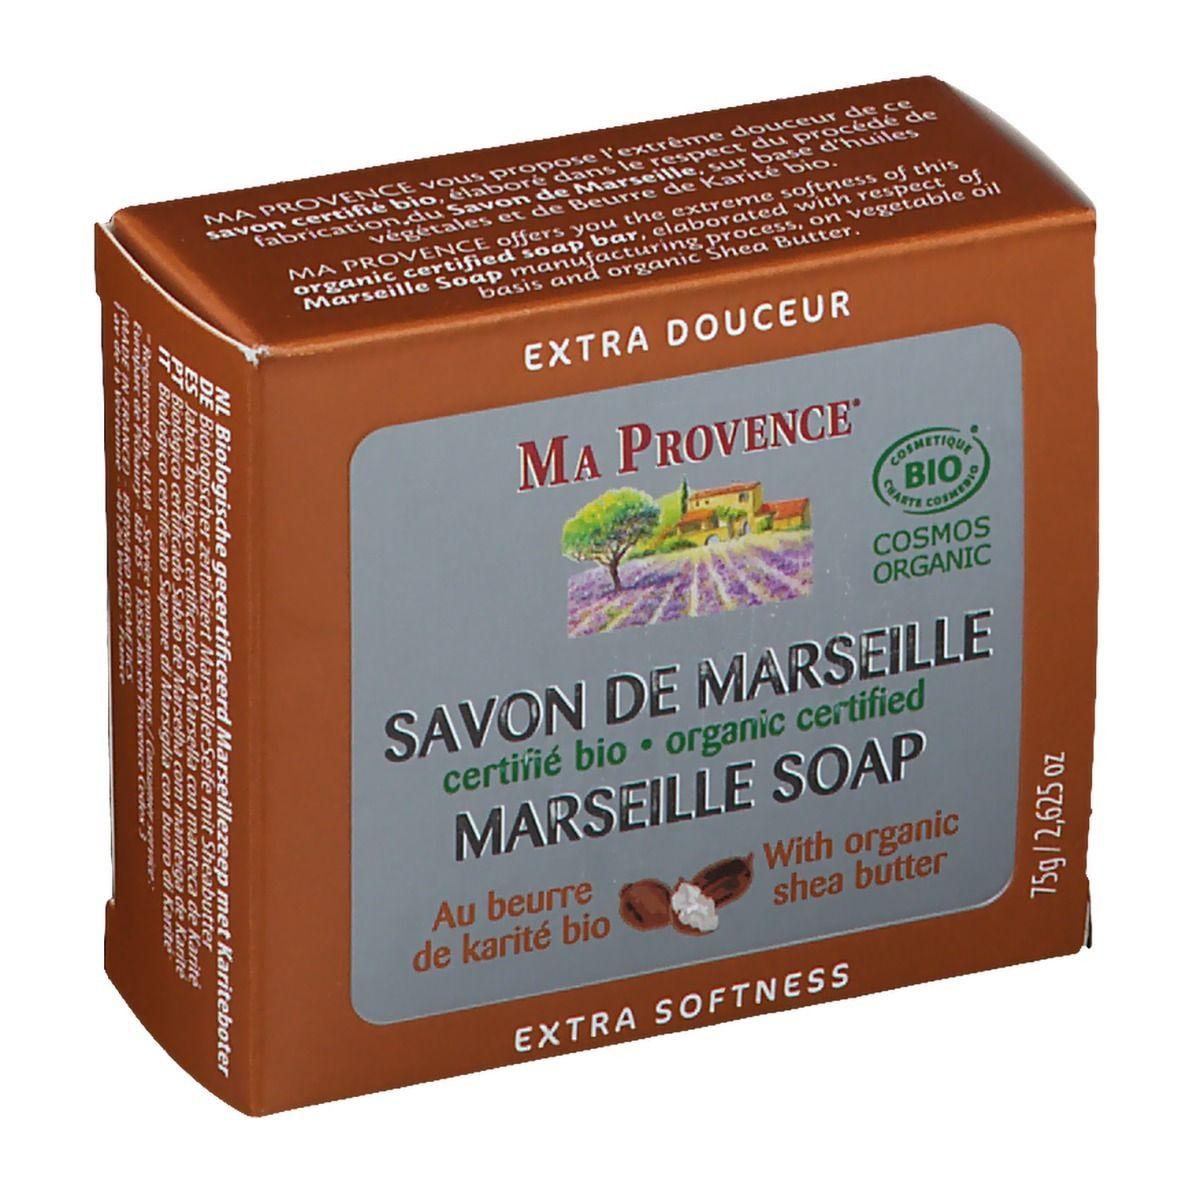 MA Provence® Ma Provence Savon de Marseille au Beurre de karité Bio g savon